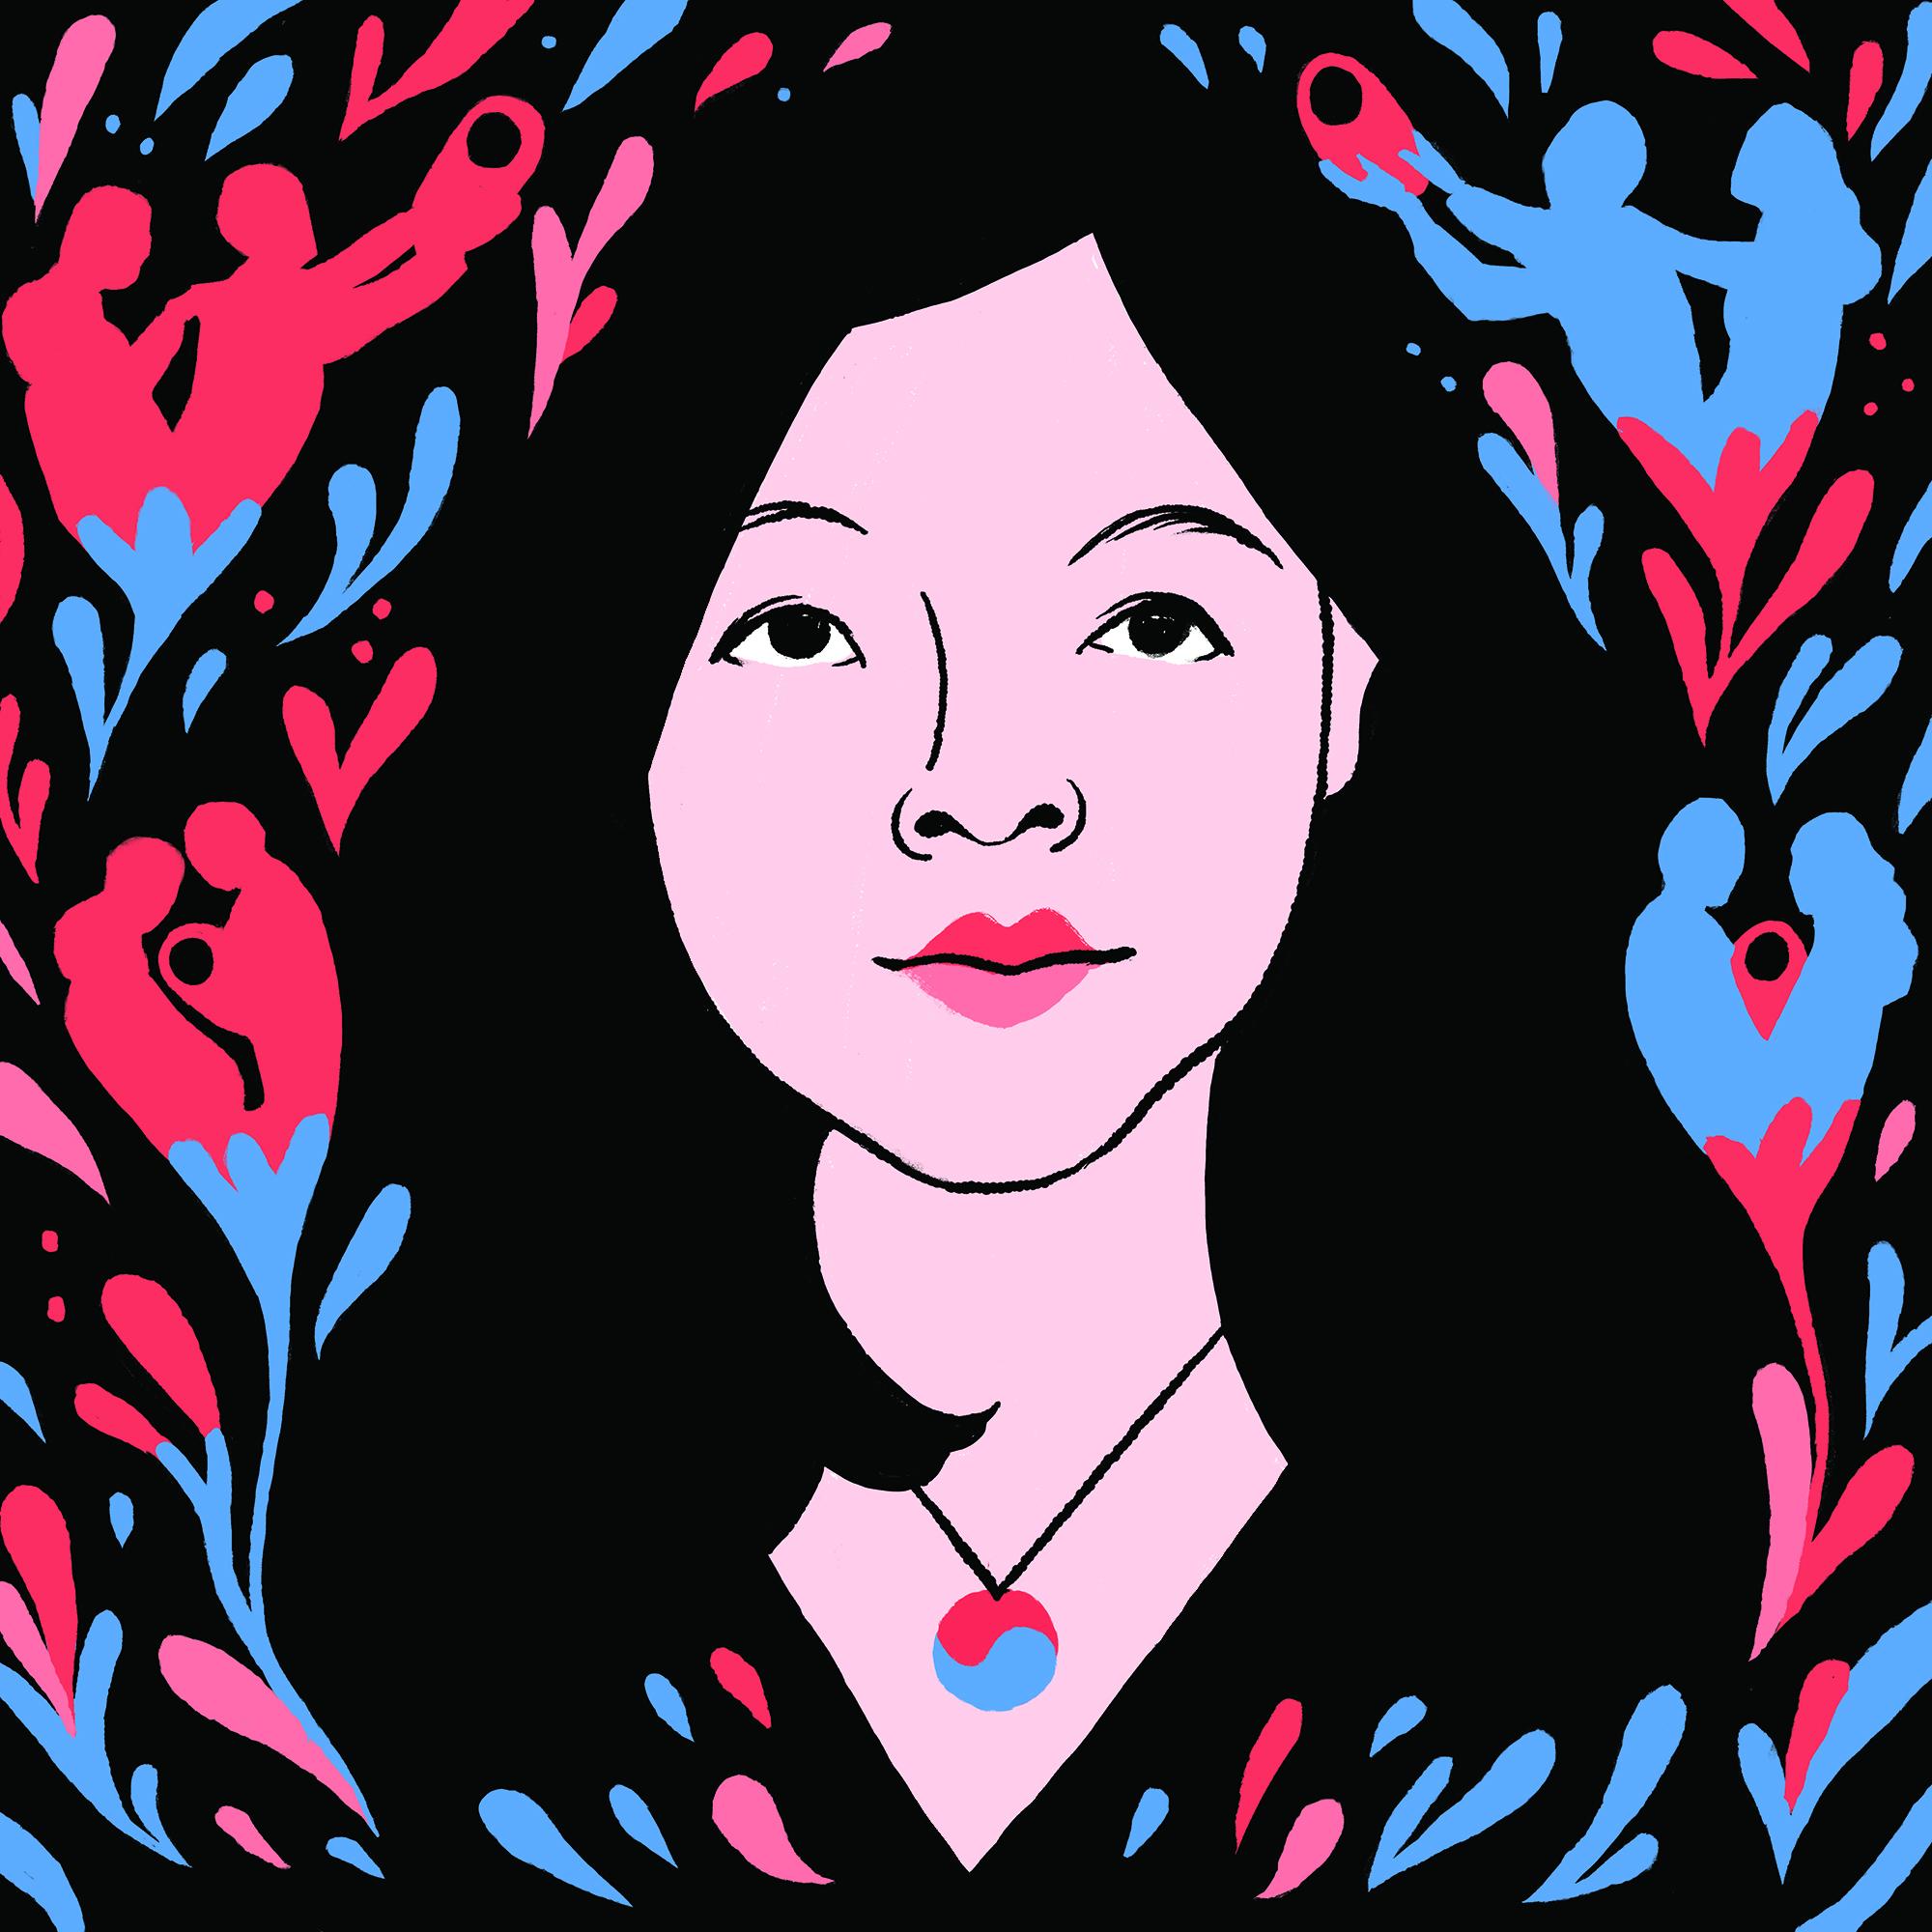 Dills, Annie_Nicole Chung portrait.jpg